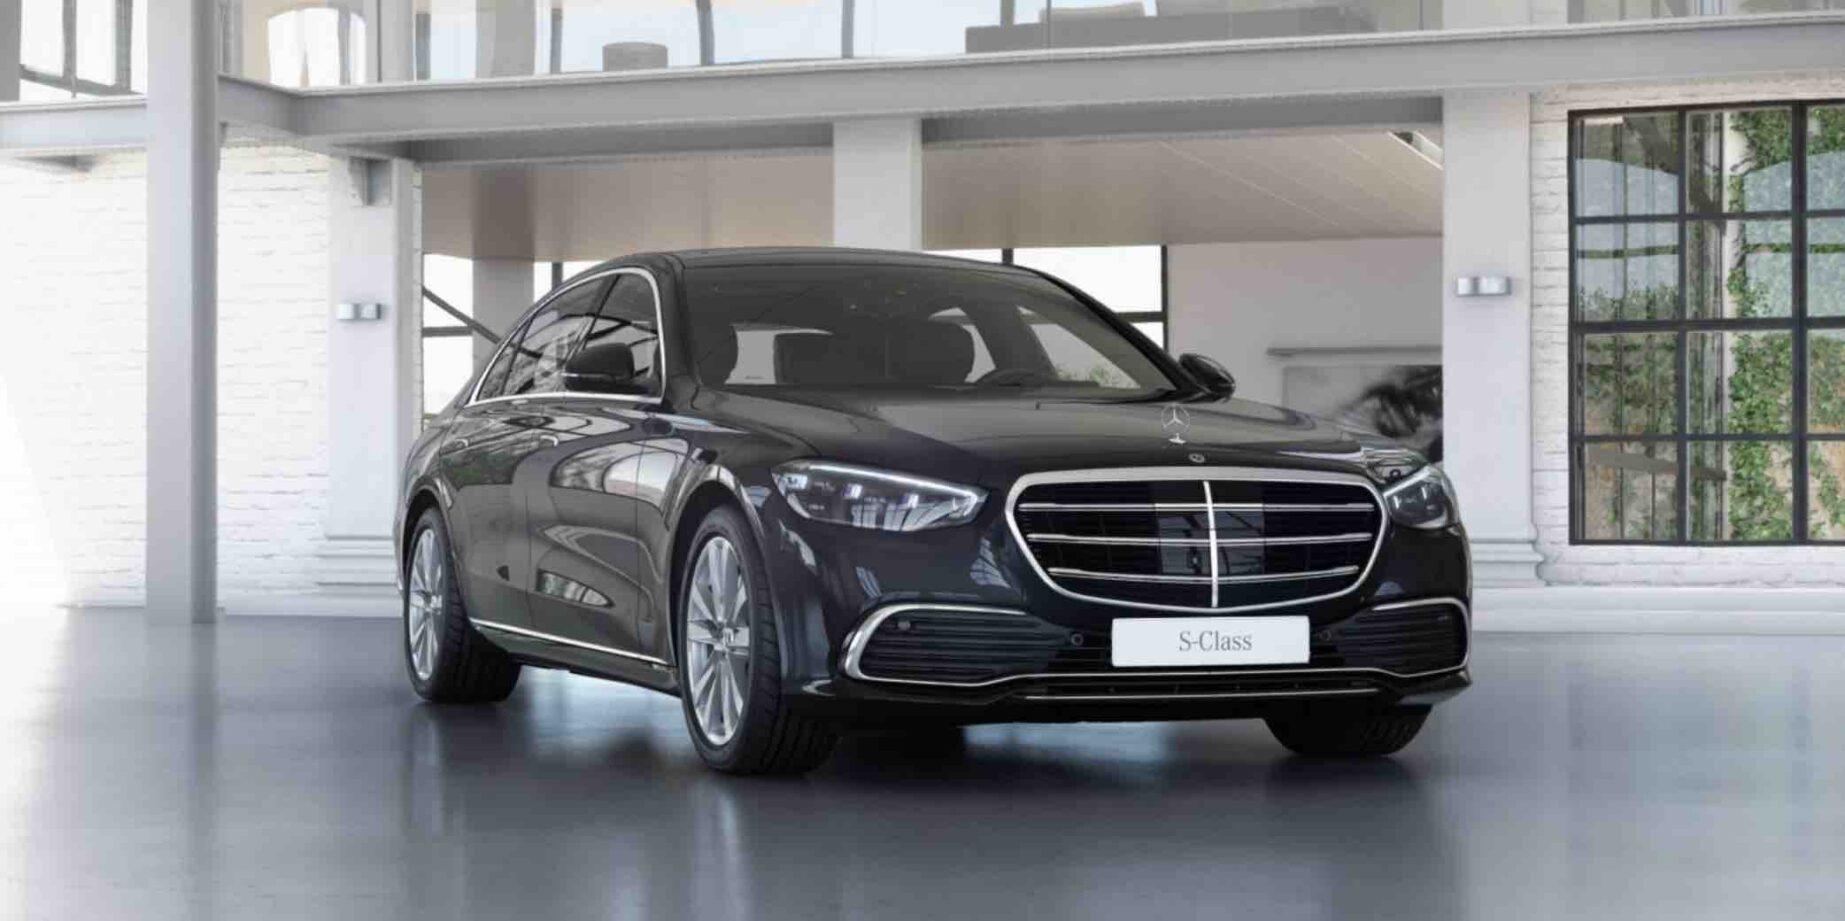 Executive Chauffeur Hire Milan – S Class